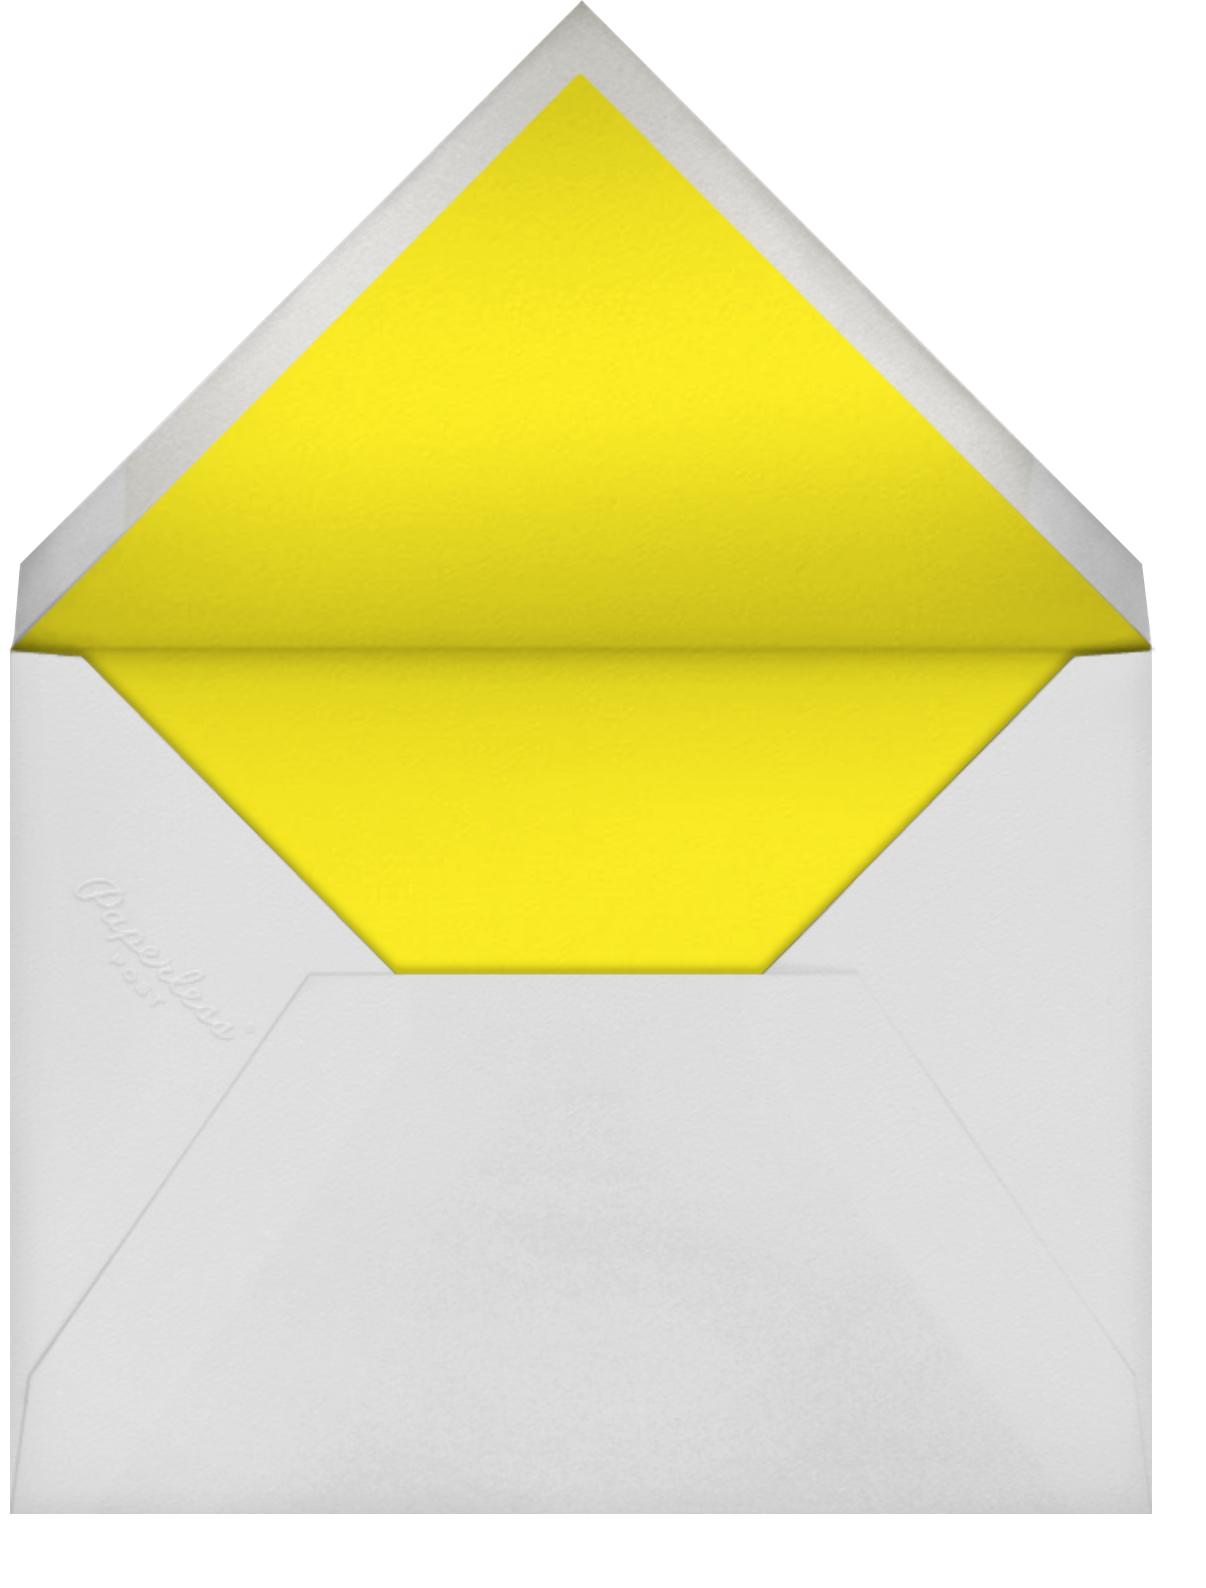 Balloon Airlift (Square) - Gray Malin - Birthday - envelope back